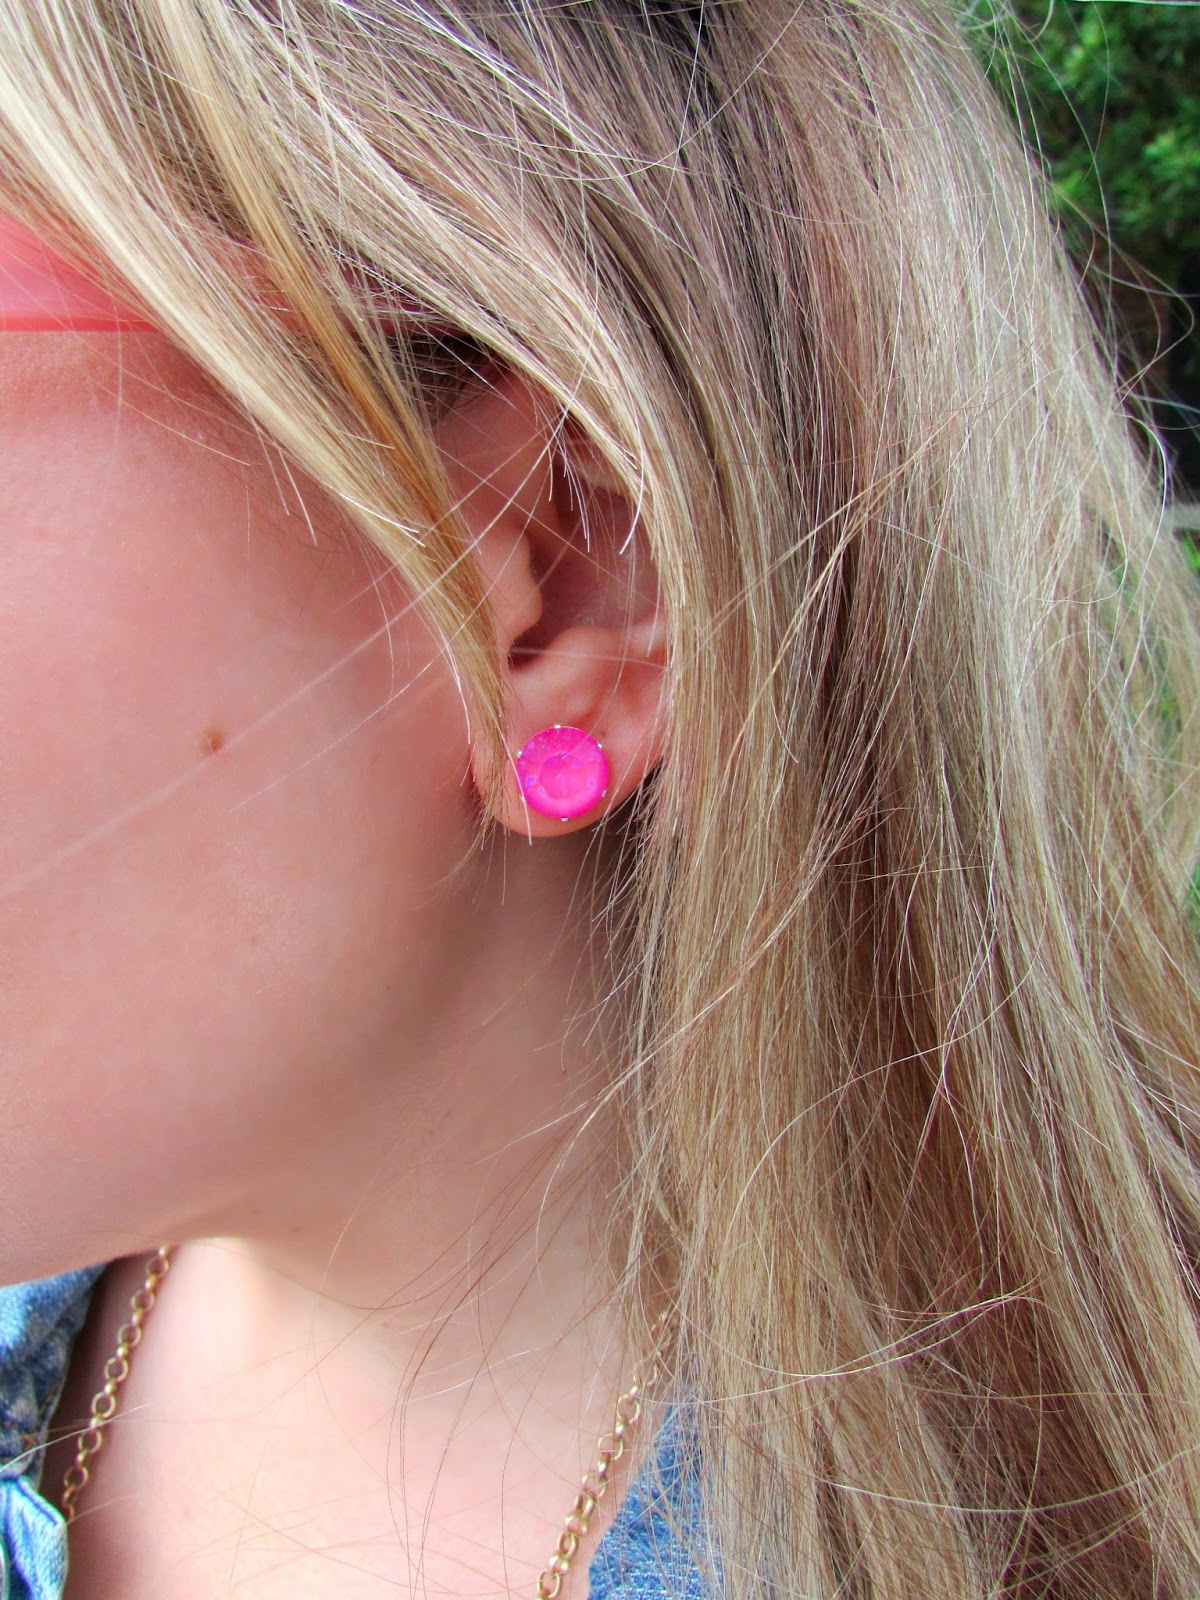 Jojo Loves You Earrings Earrings C/o Jojo Loves You